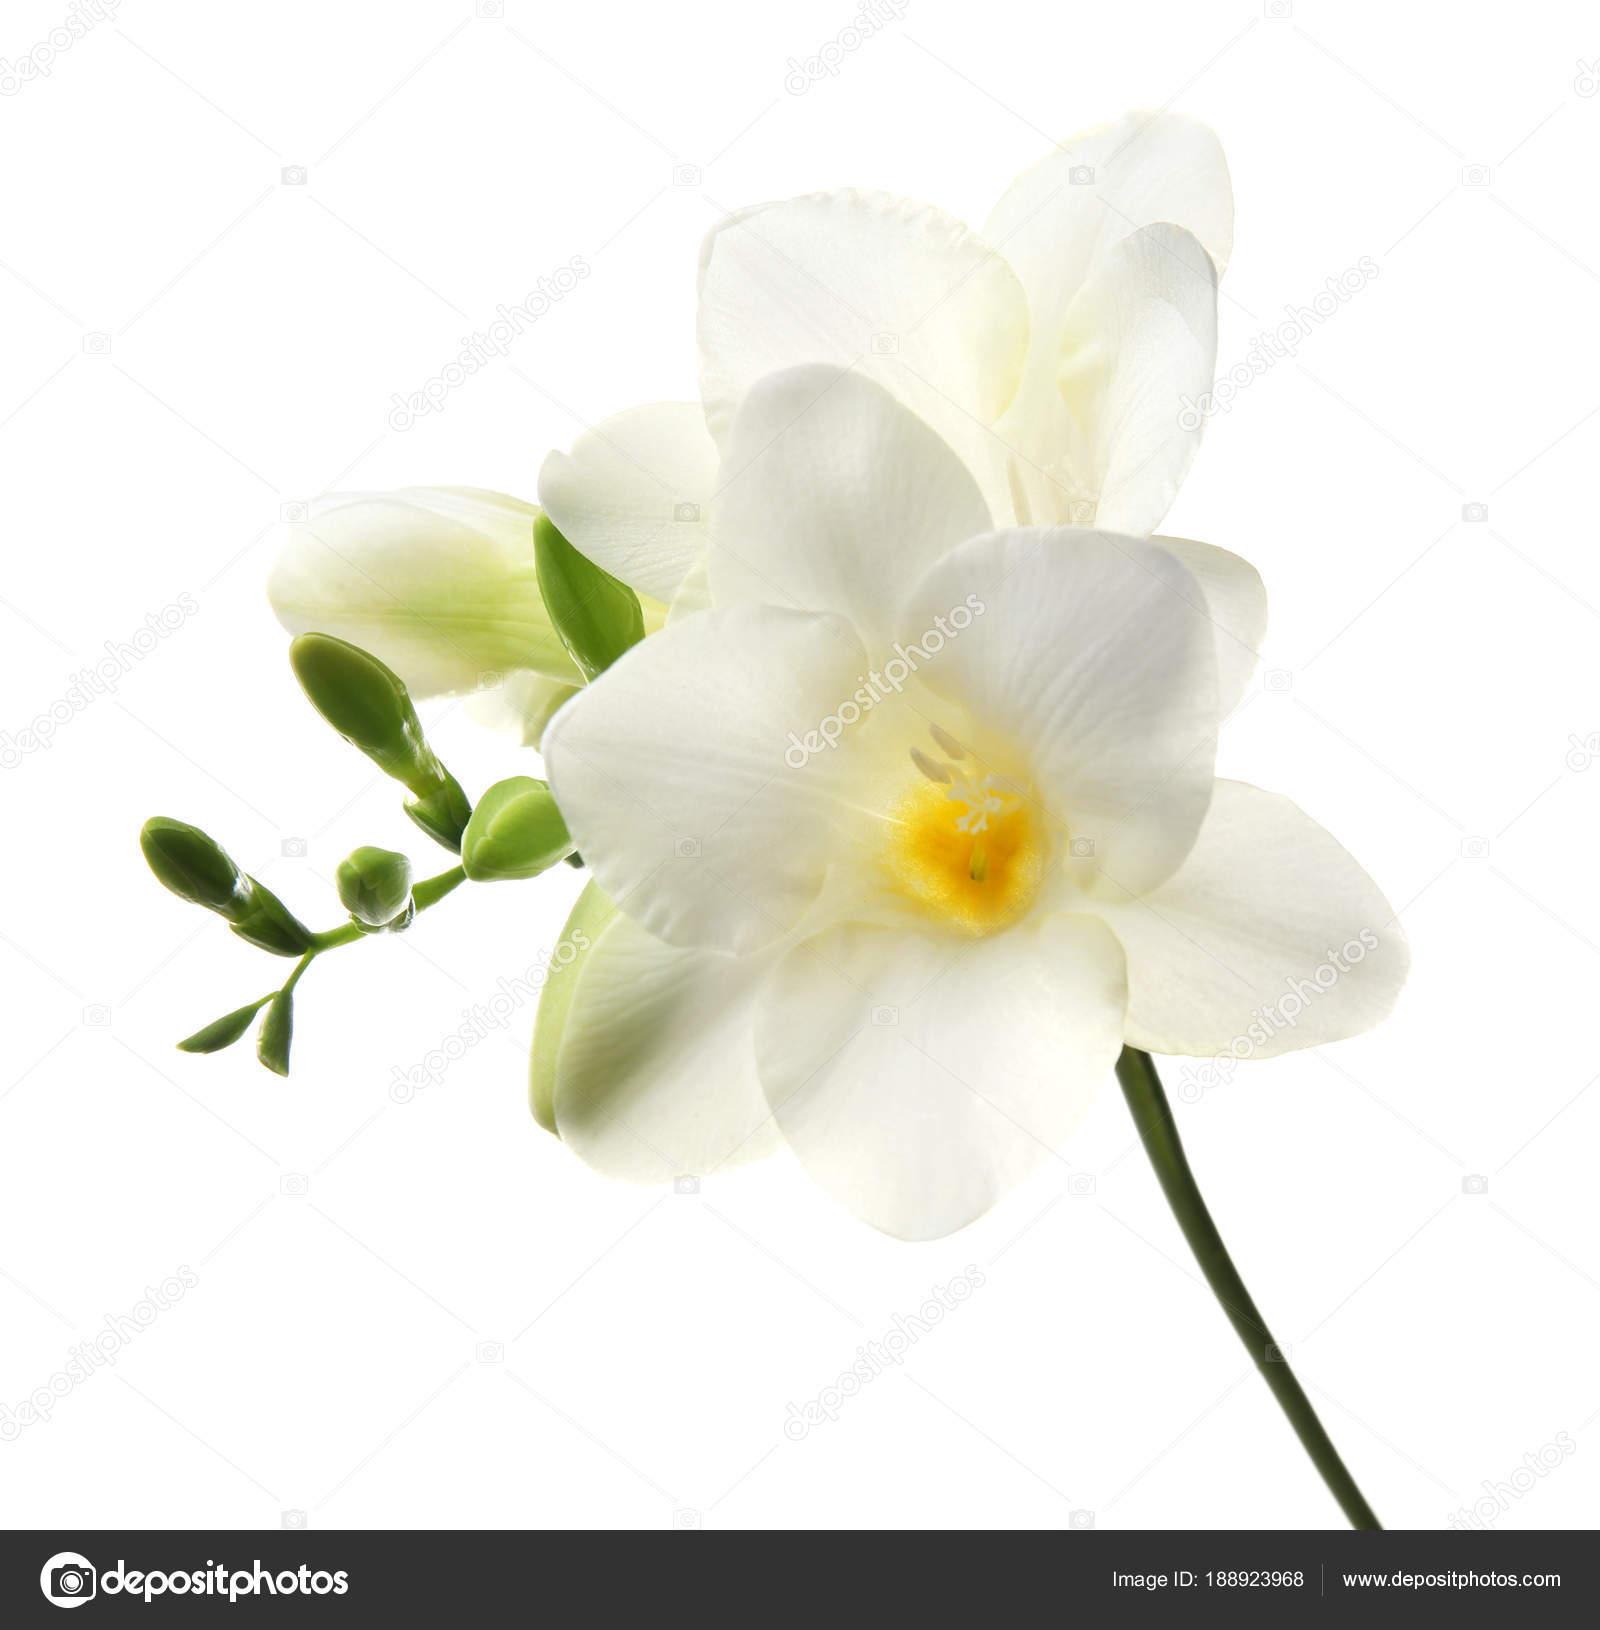 Beautiful freesia flower on white background stock photo beautiful freesia flower on white background photo by liudmilachernetskagmail mightylinksfo